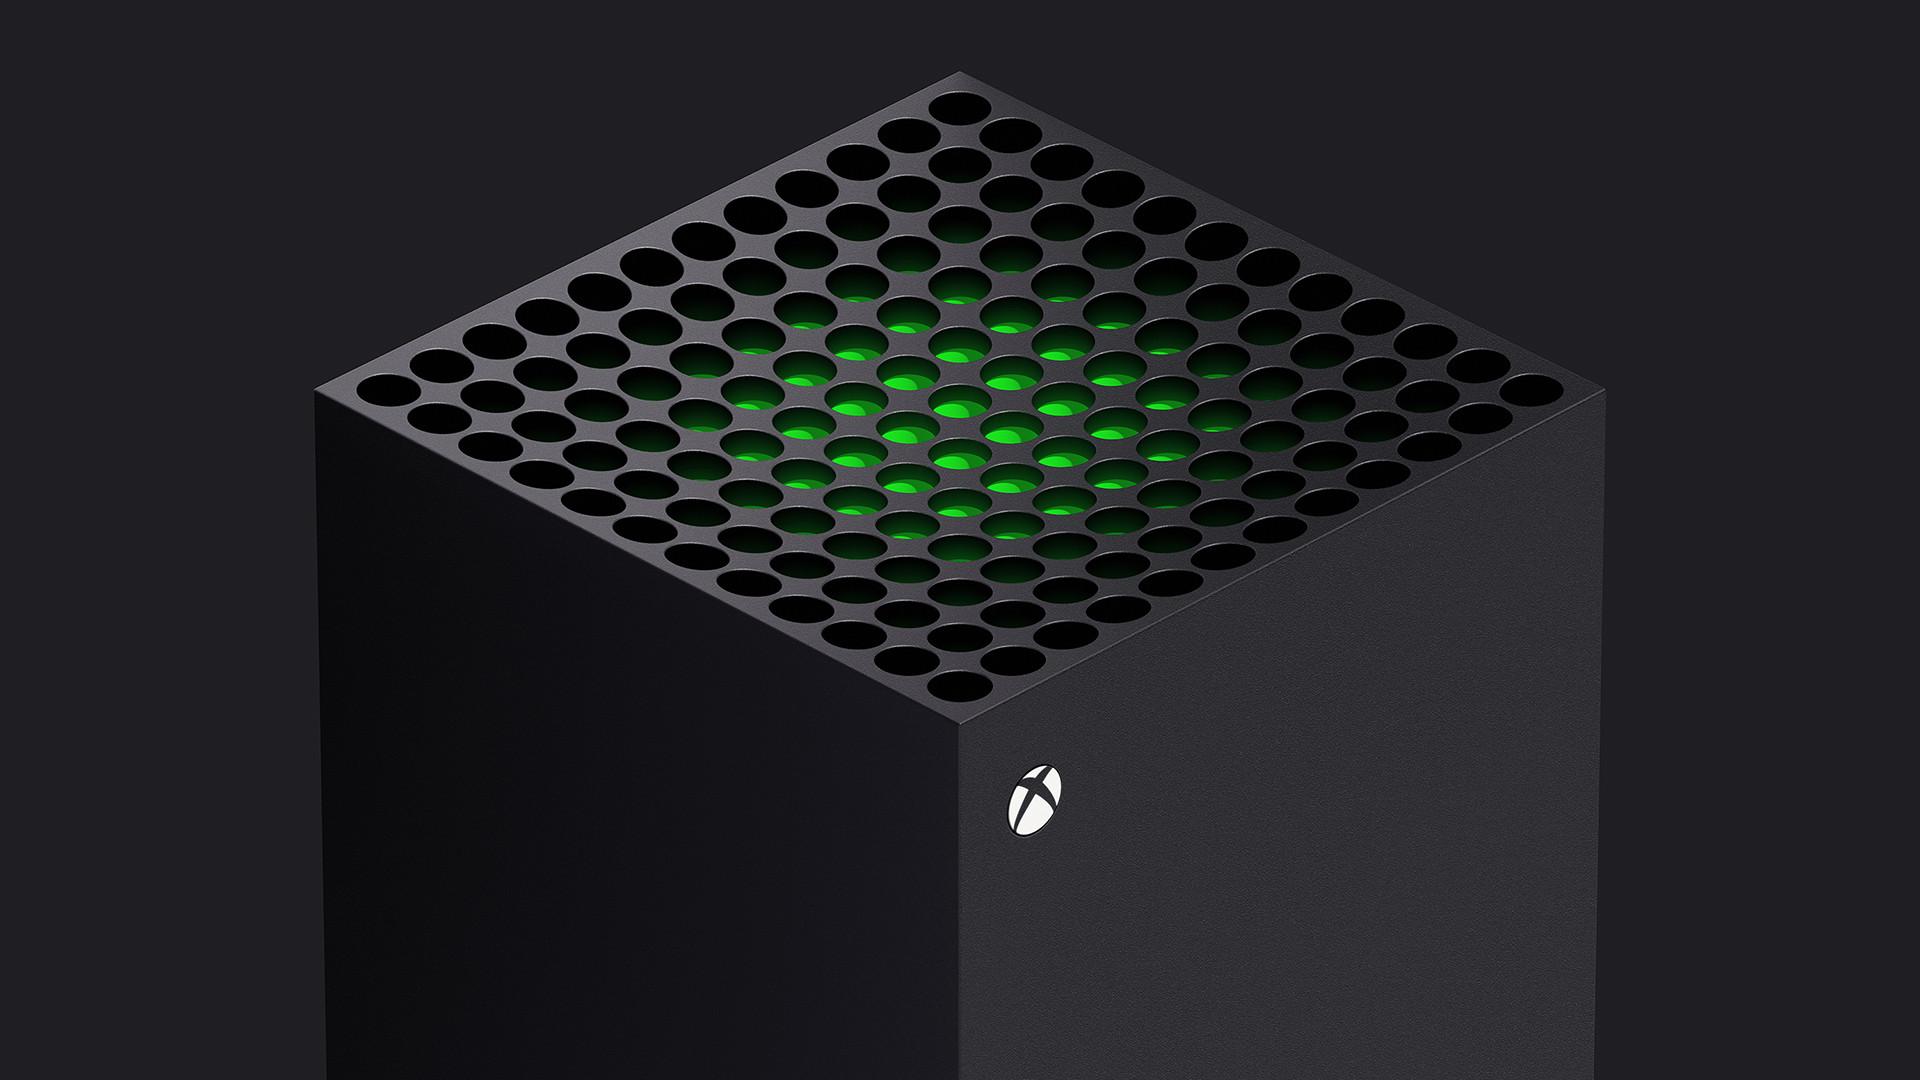 Xbox Tokyo Game Show presentation won't reveal new Xbox Series X information